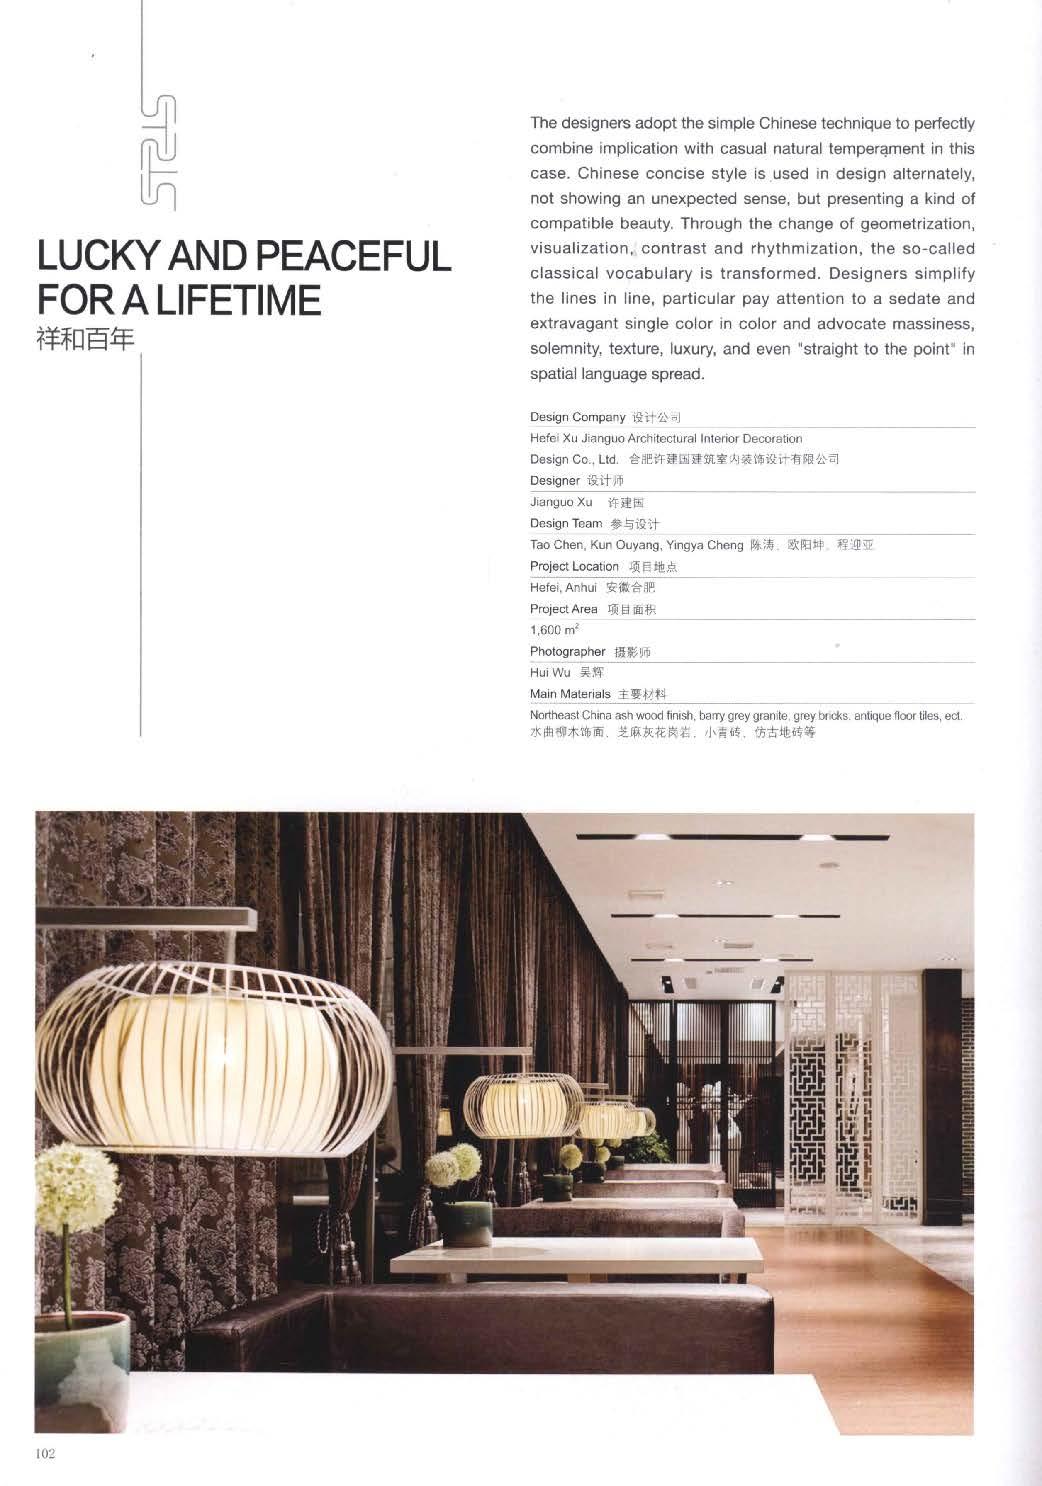 H073 东方风情 会所、餐饮细部解析_Page_100.jpg